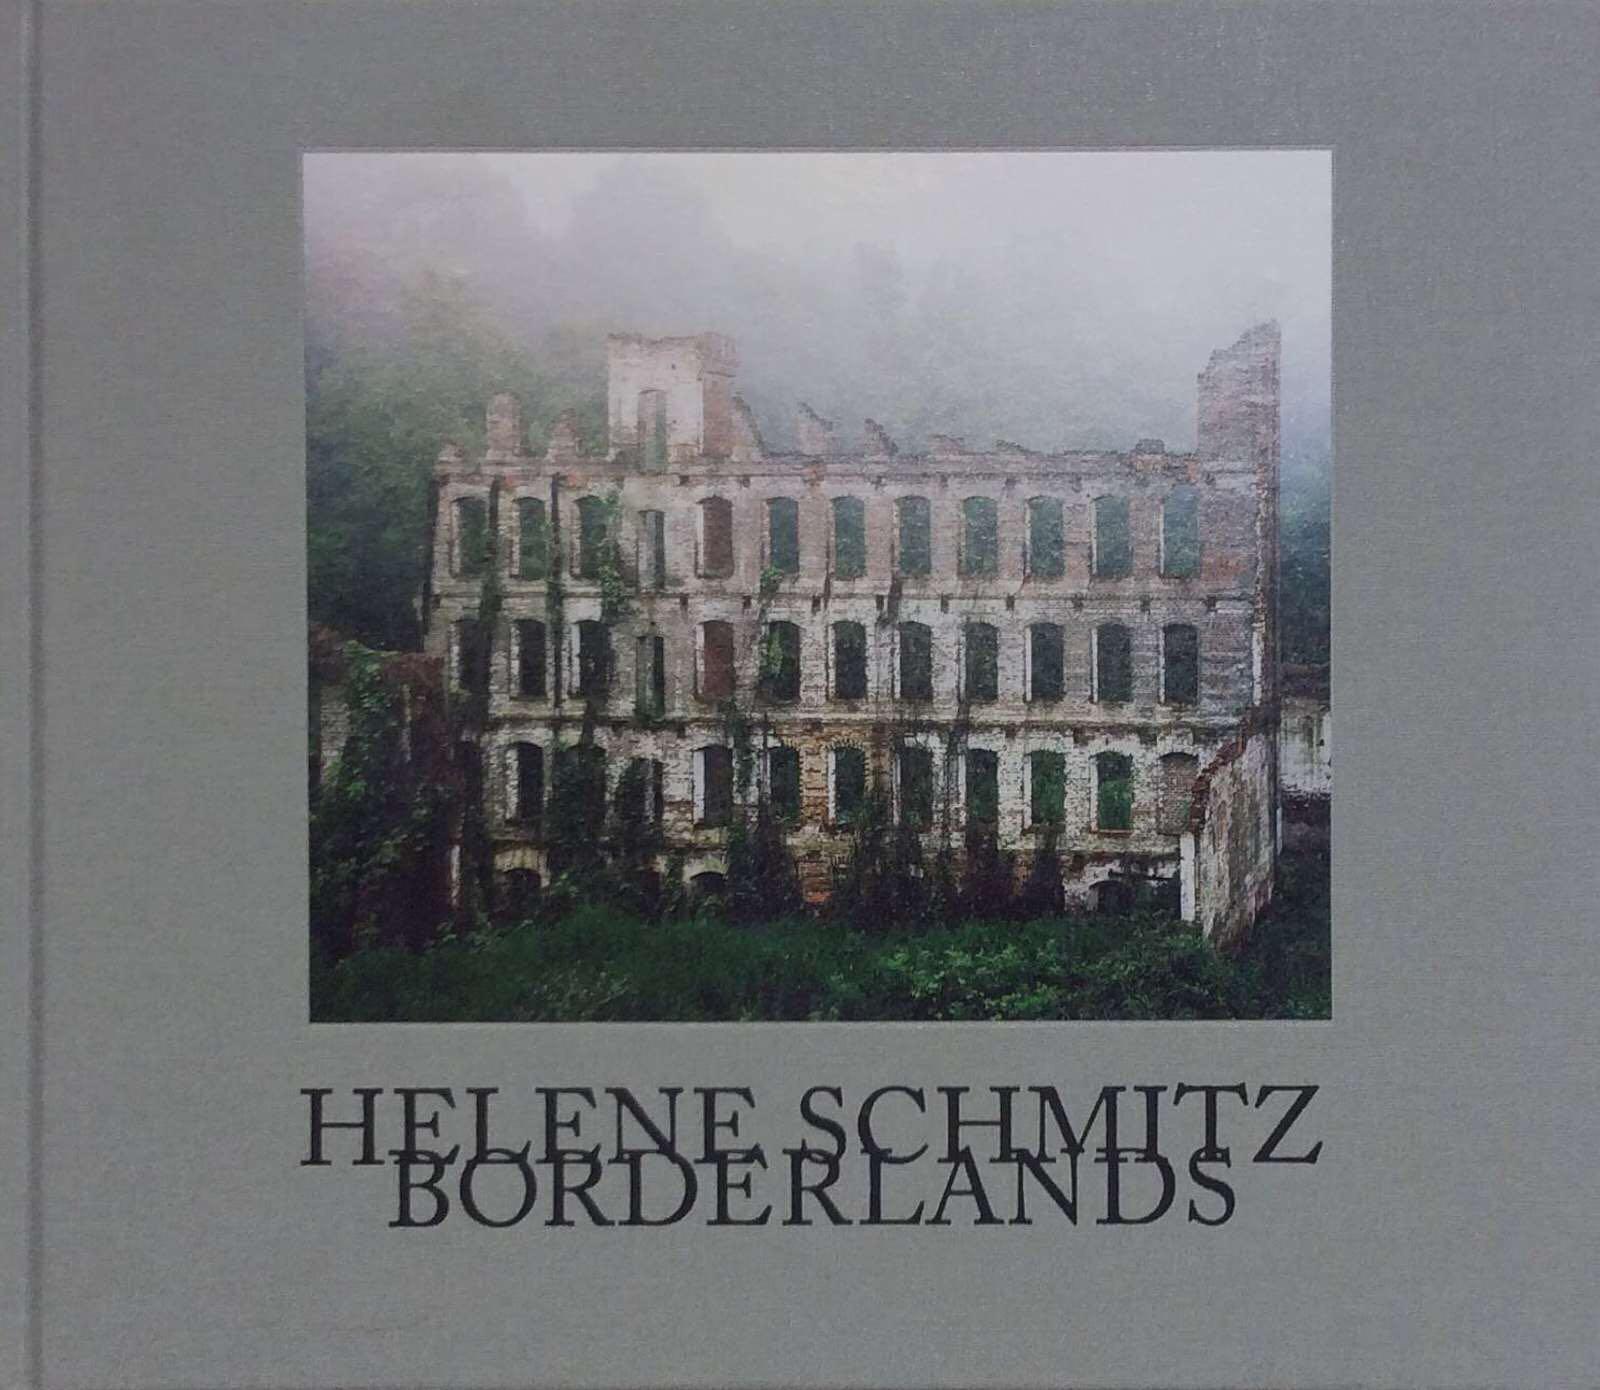 Schmitz, Helene. Borderlands